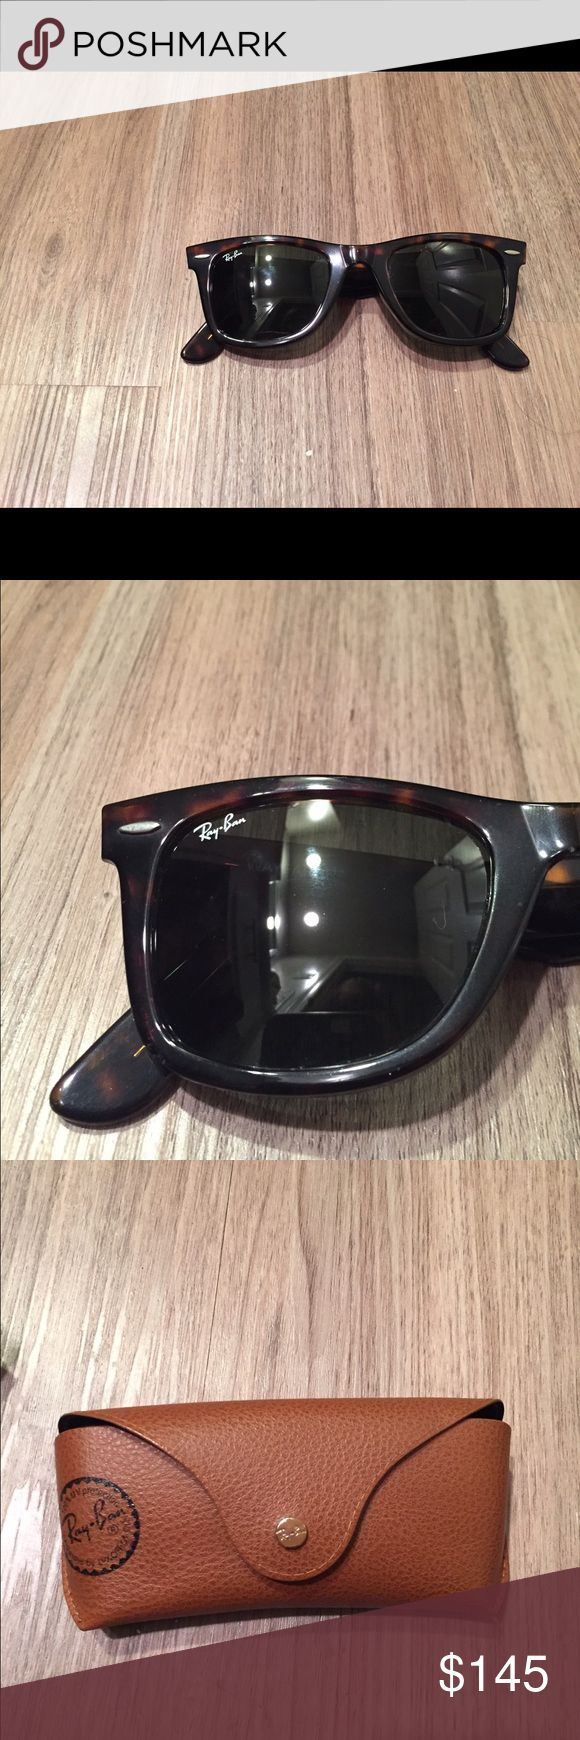 Ray Ban Wayfarer Tortoise shell Ray-Ban Accessories Sunglasses